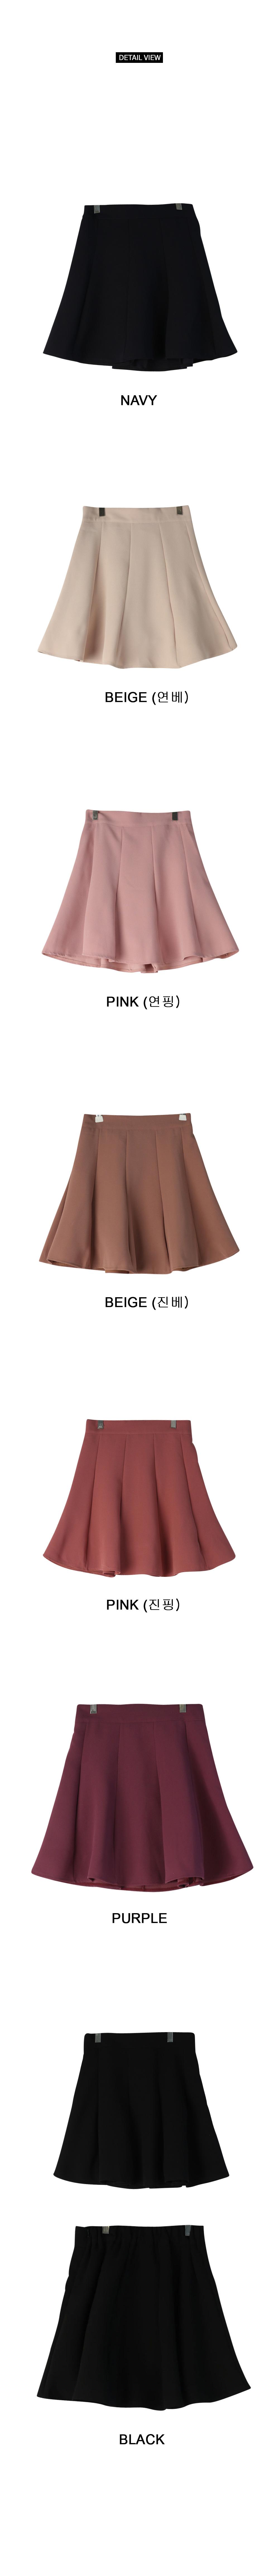 High-cut flared skirt